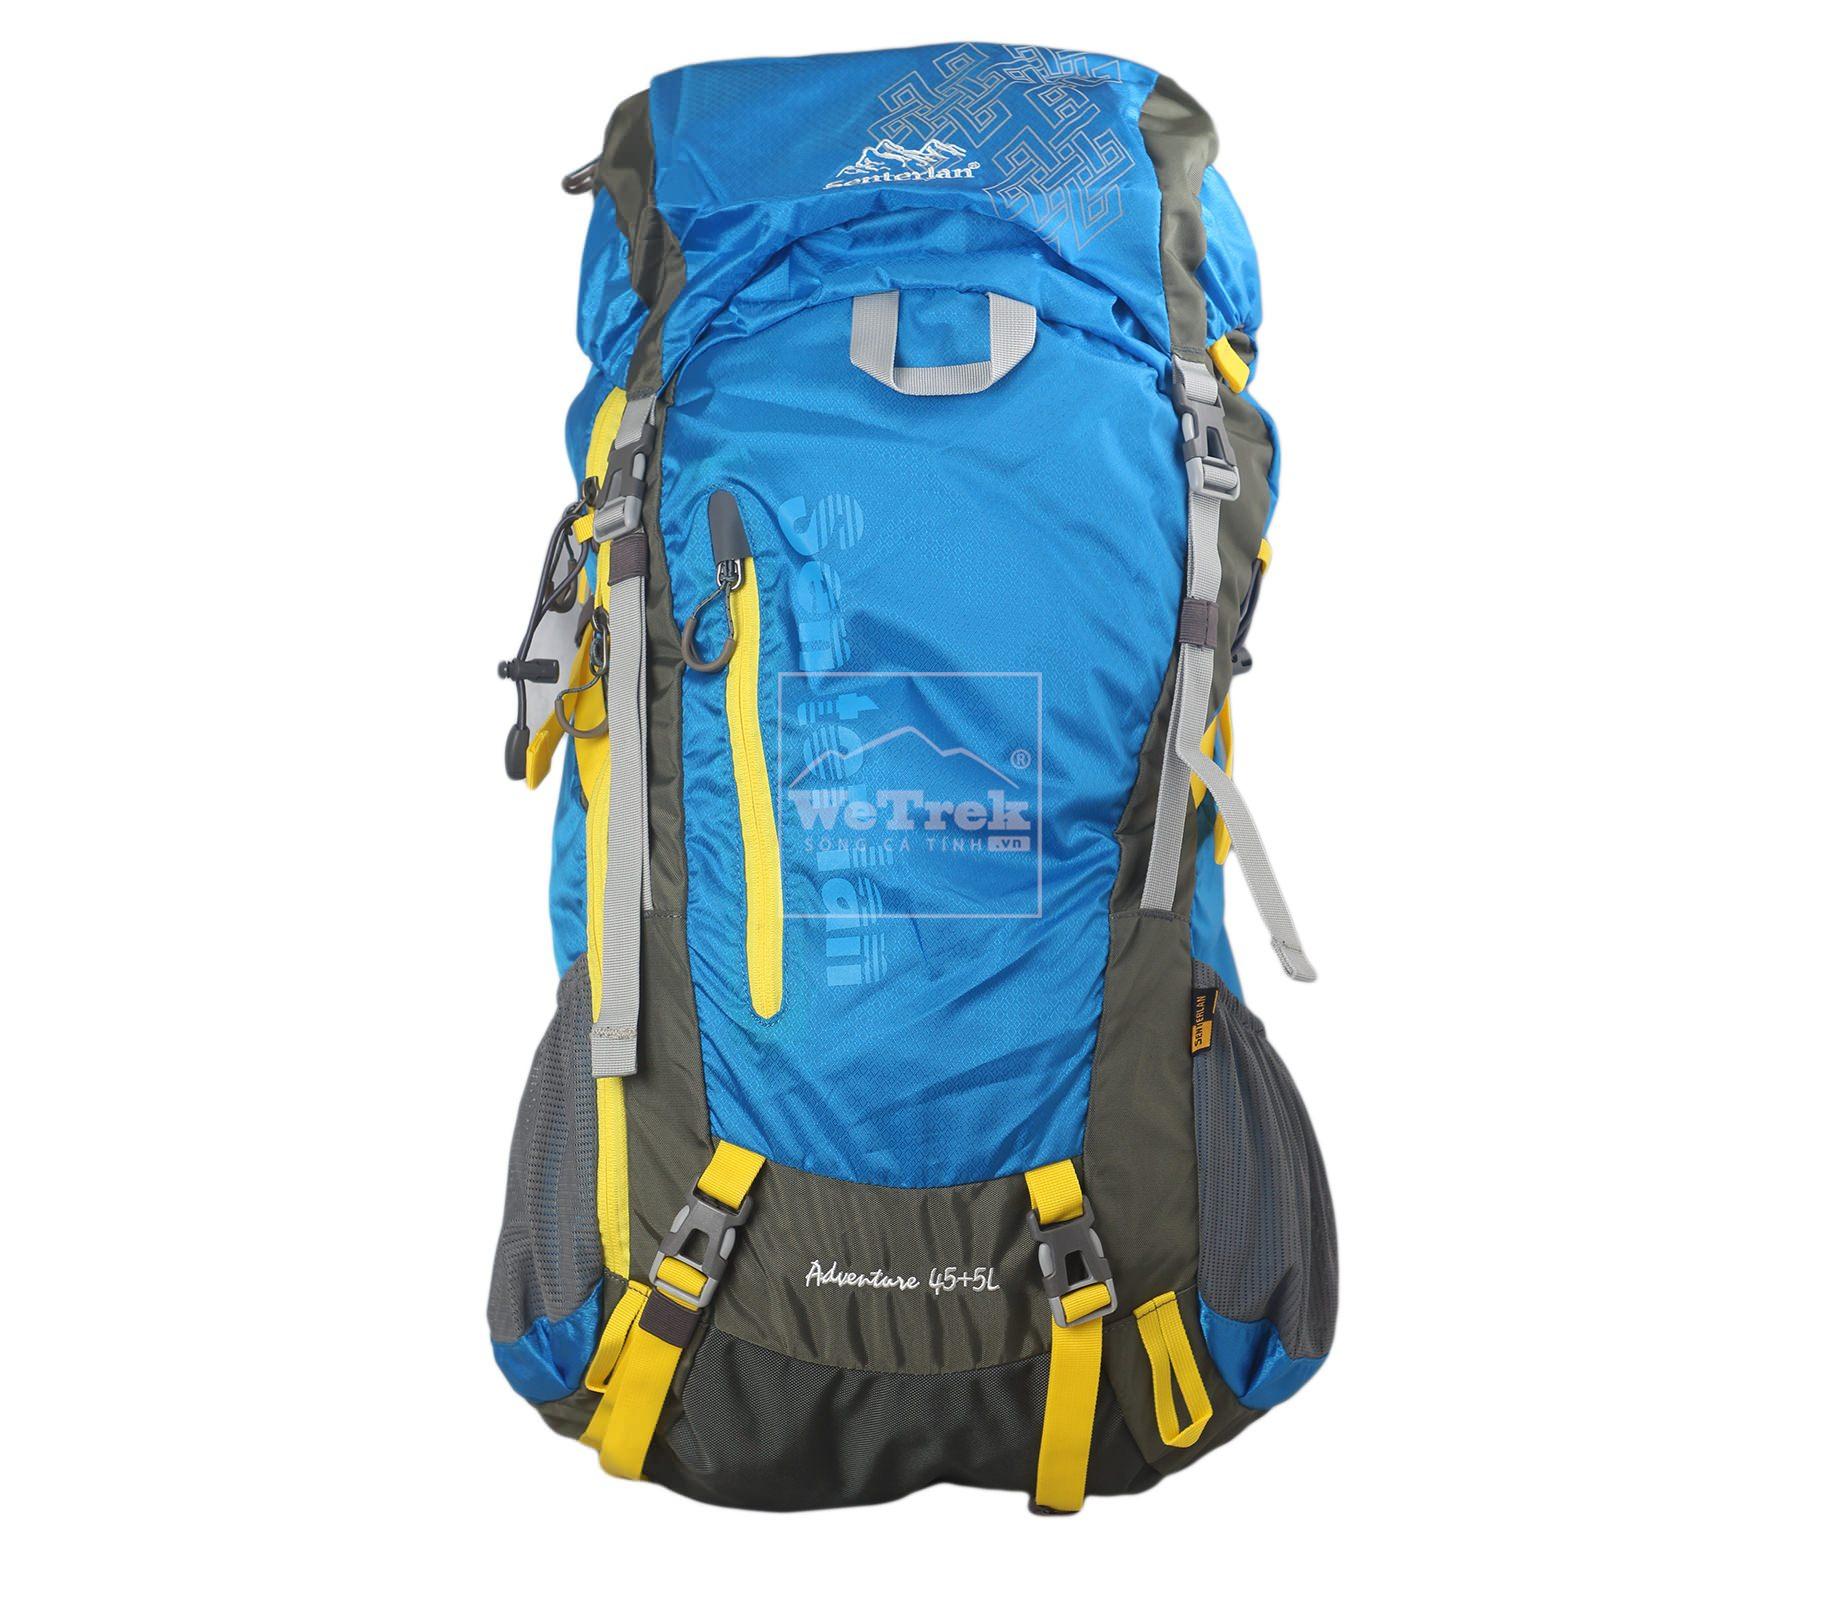 Balo leo núi Senterlan Adventure 45+5L S2375 Blue - 5692